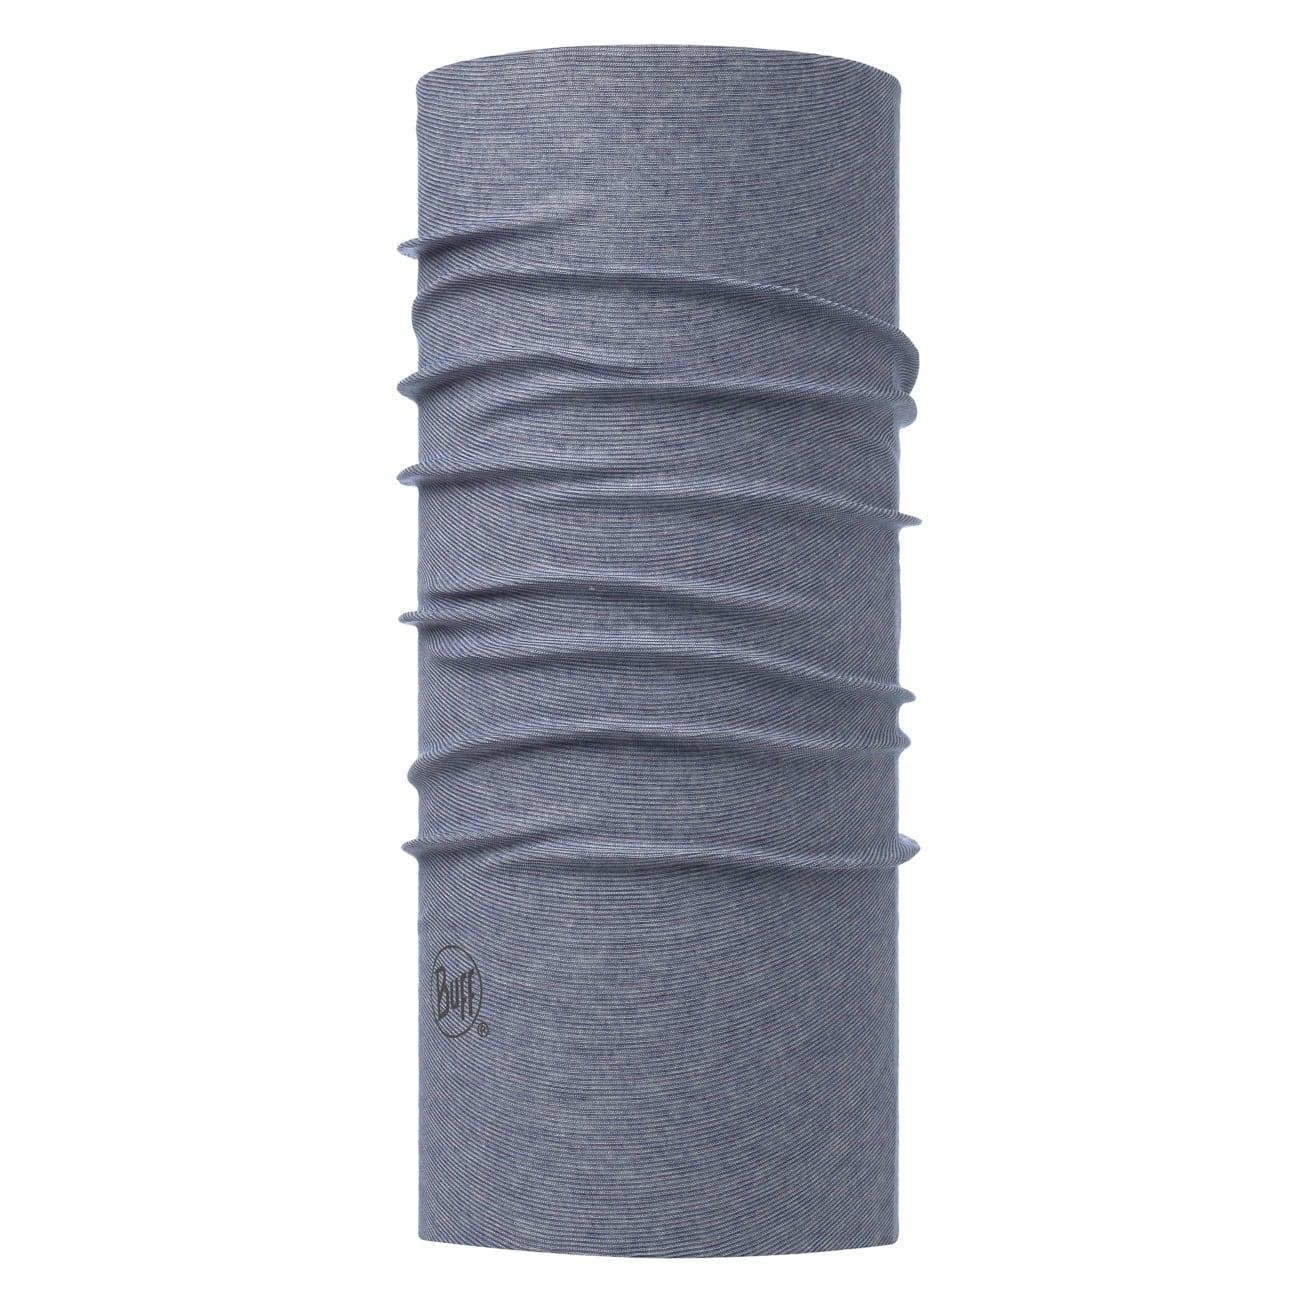 Bandana Multifuncional Blue Ink Stripes by BUFF  cinta para la cabeza